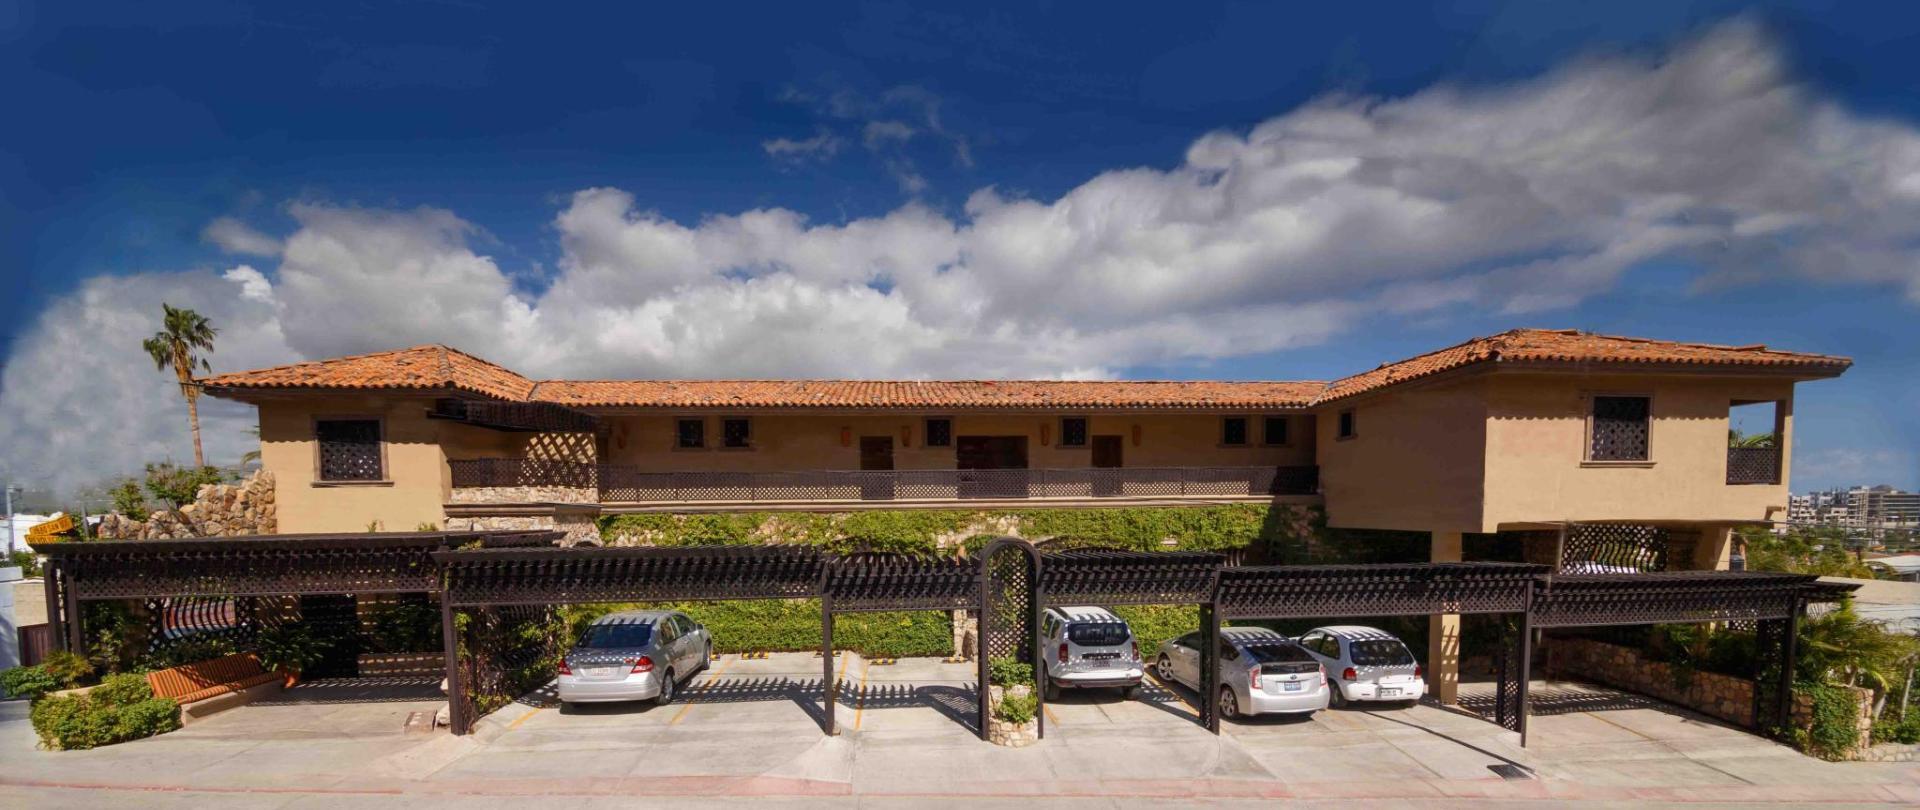 Cabo Vista Hotel